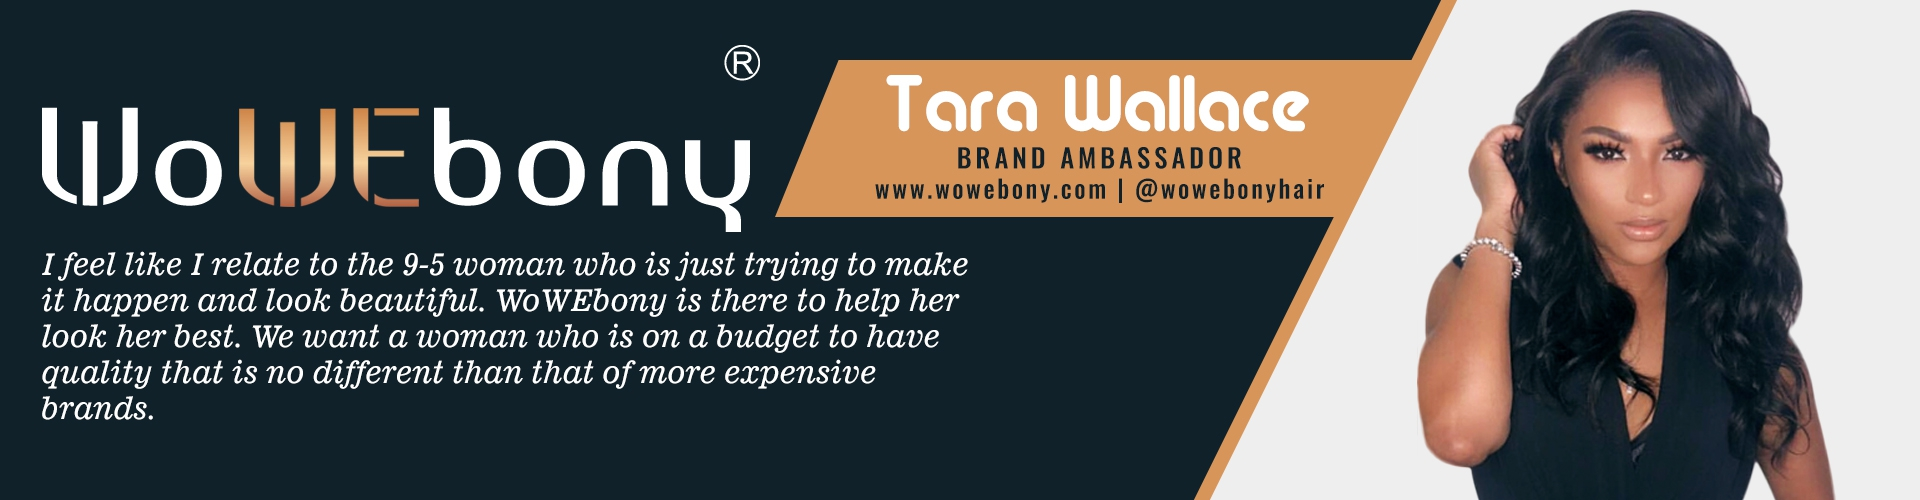 Tara Wallace Brand Ambassador